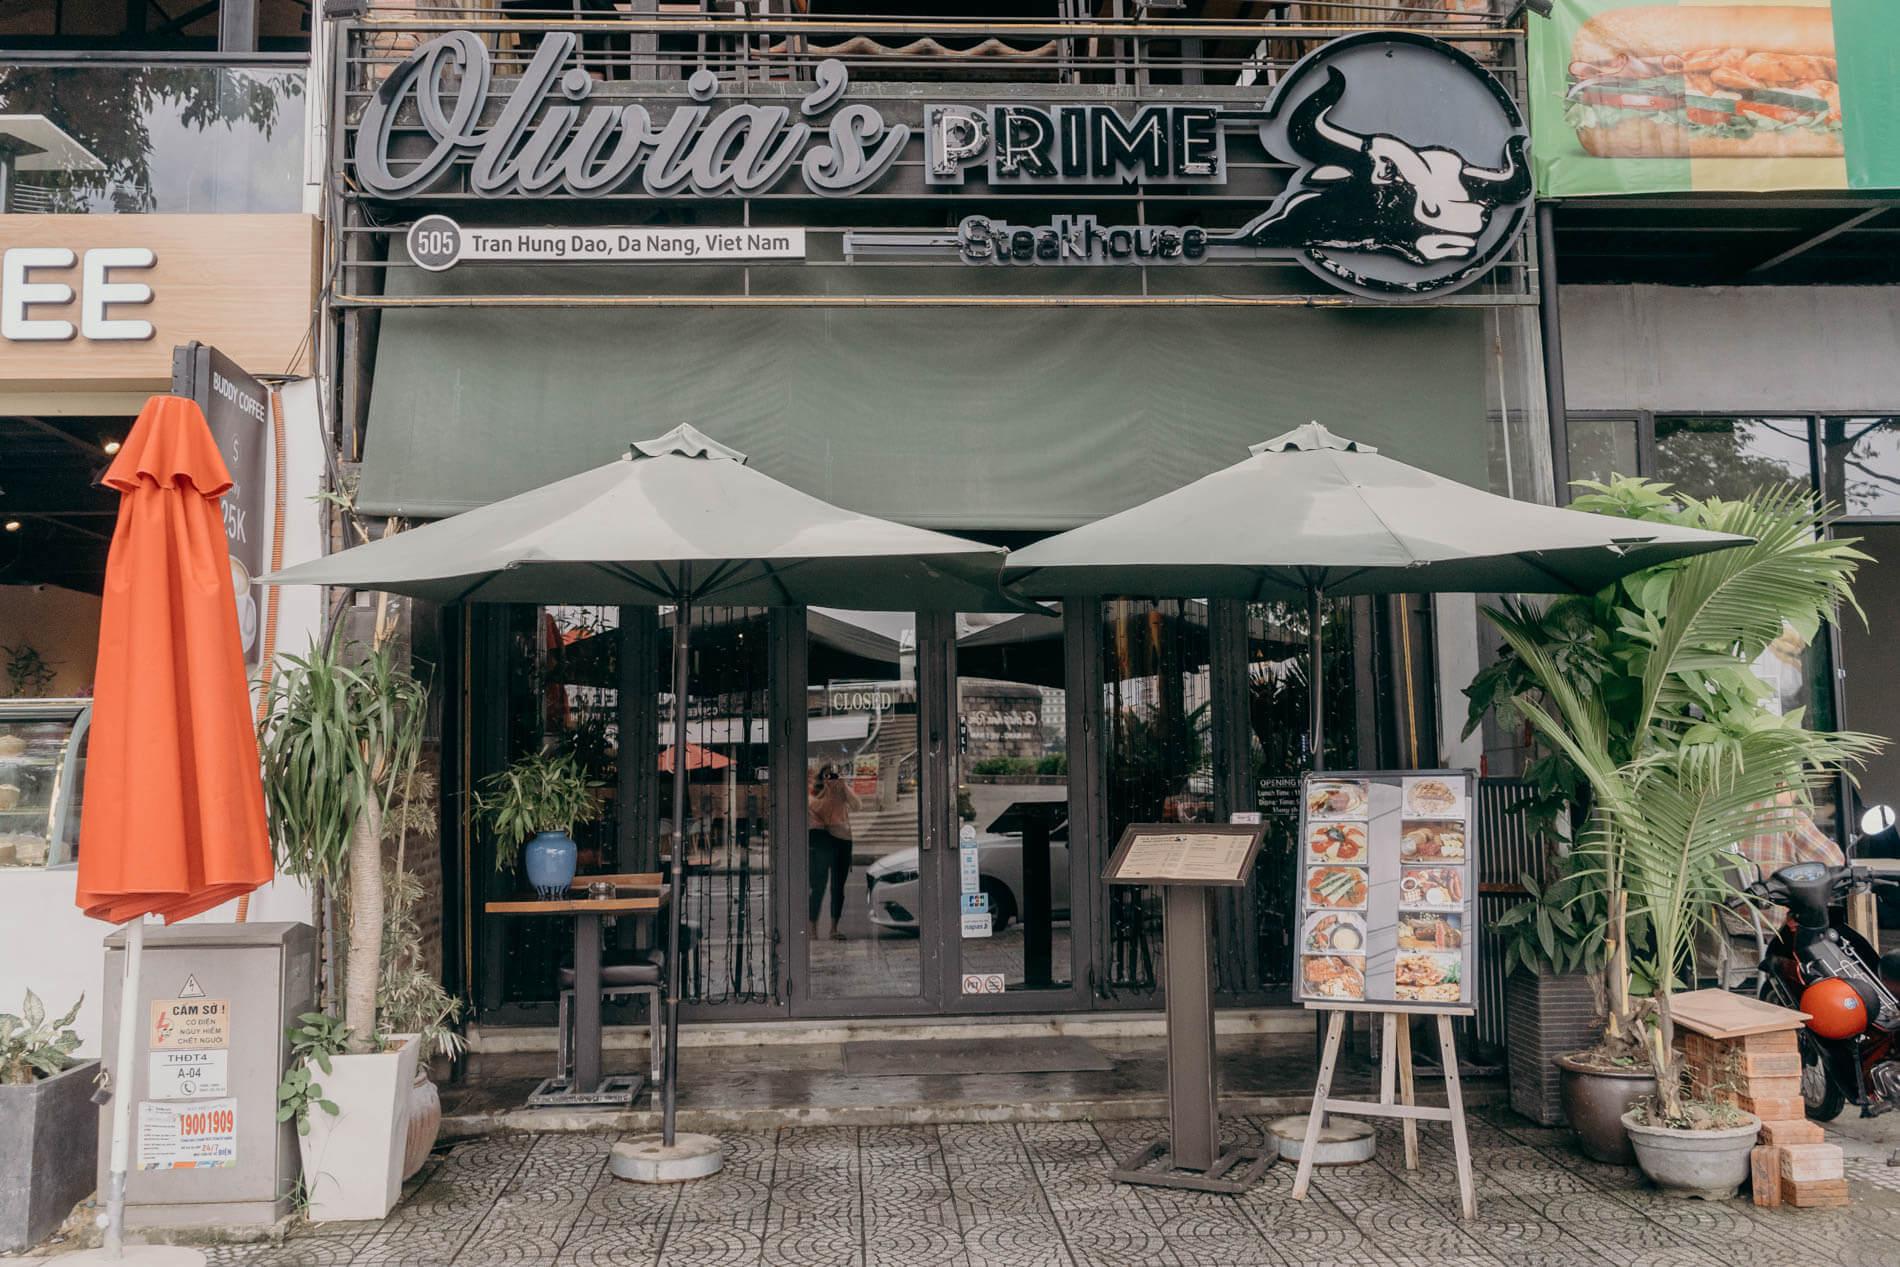 Olivia's Prime Steakhouse entrance